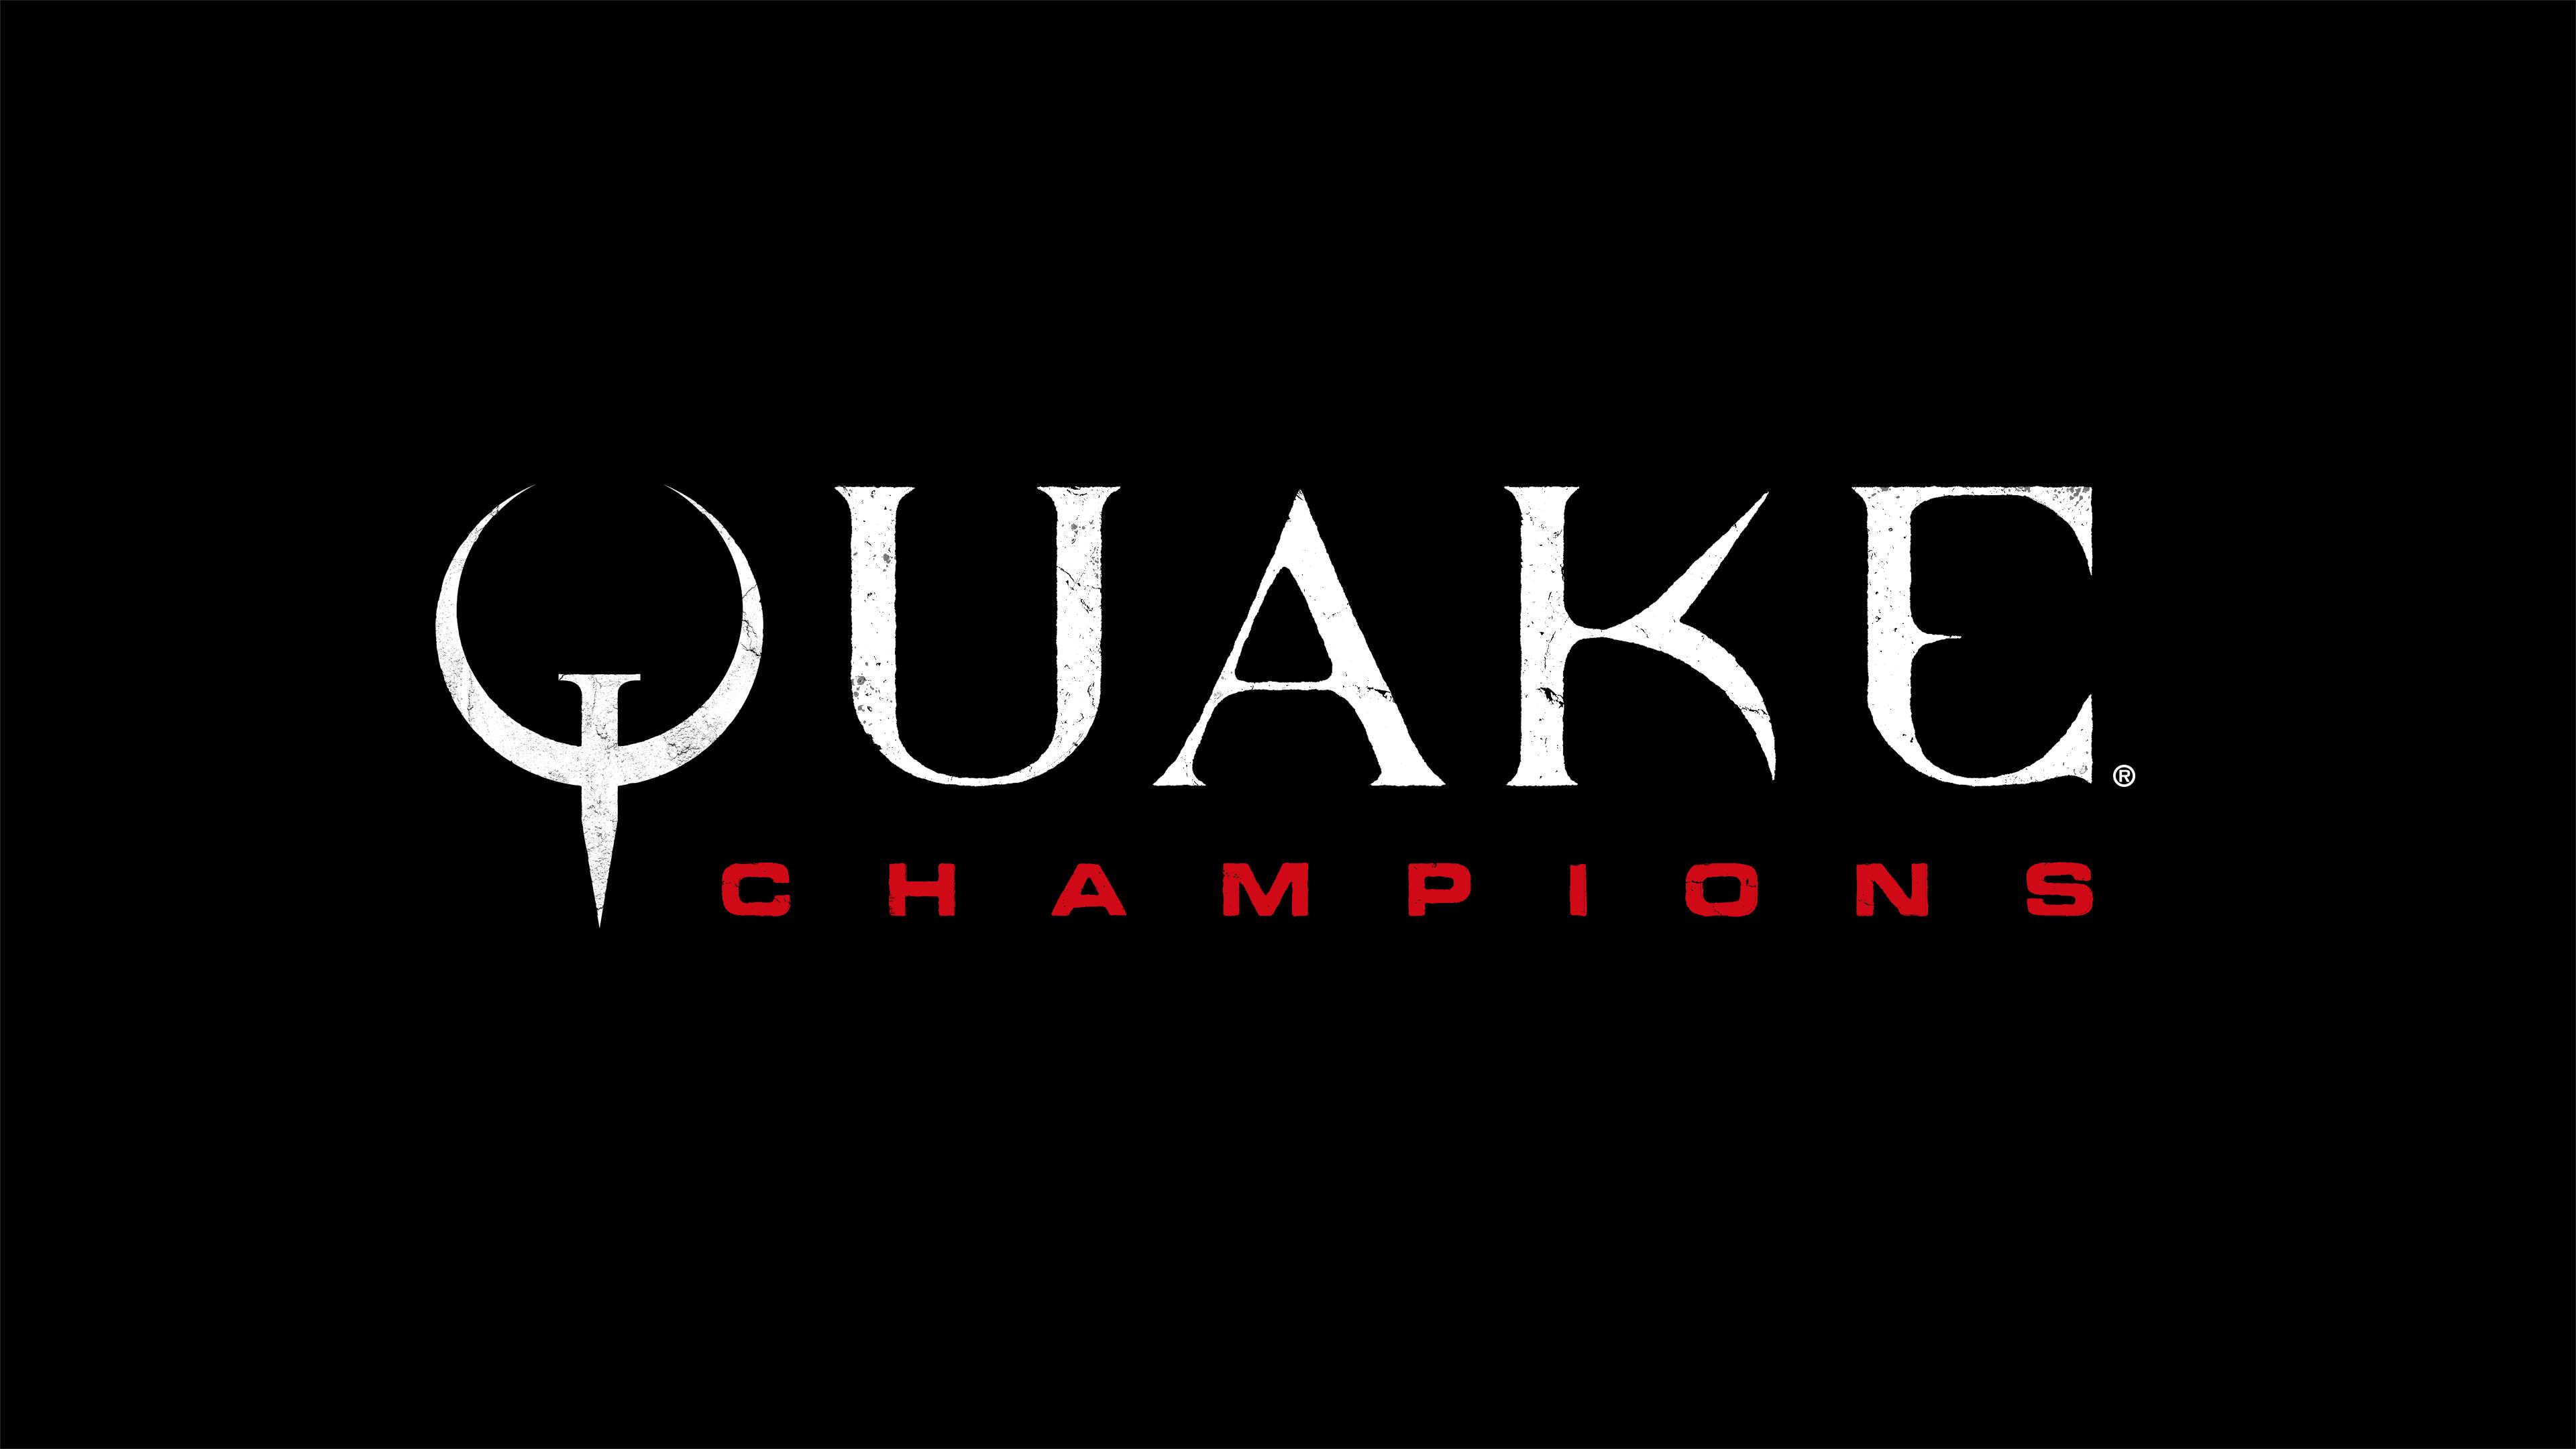 Quake Champions Logo © 2016 Bethesda Softworks LLC